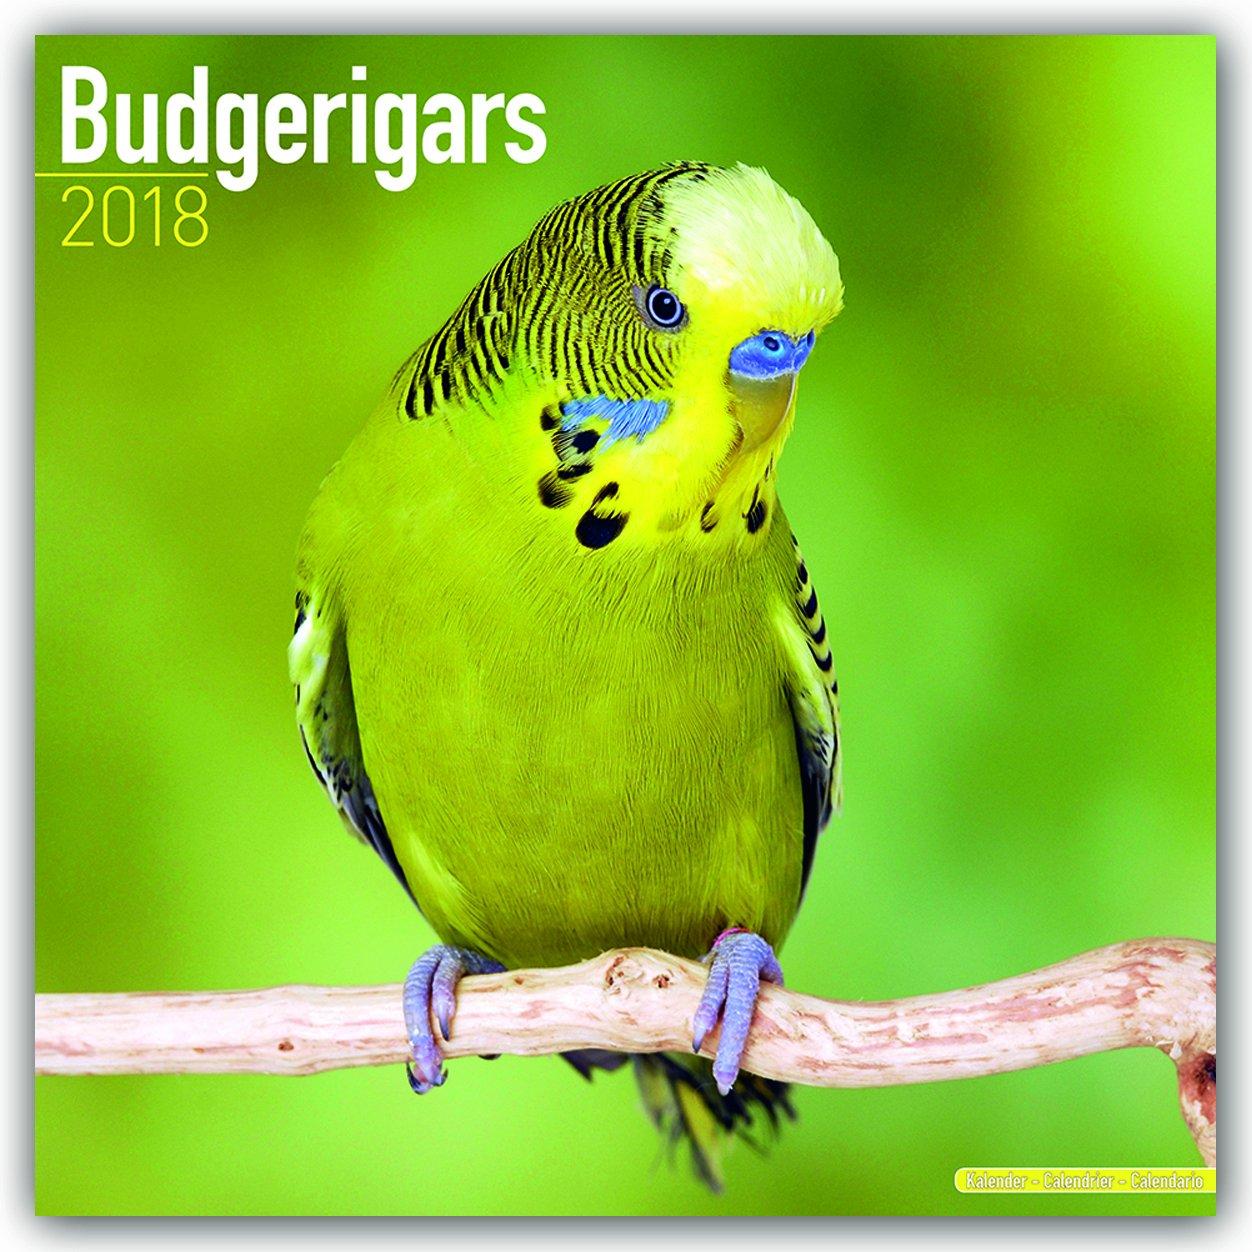 Budgerigars - Wellensittiche 2018: Original Avonside-Kalender [Mehrsprachig] [Kalender] (Wall-Kalender)